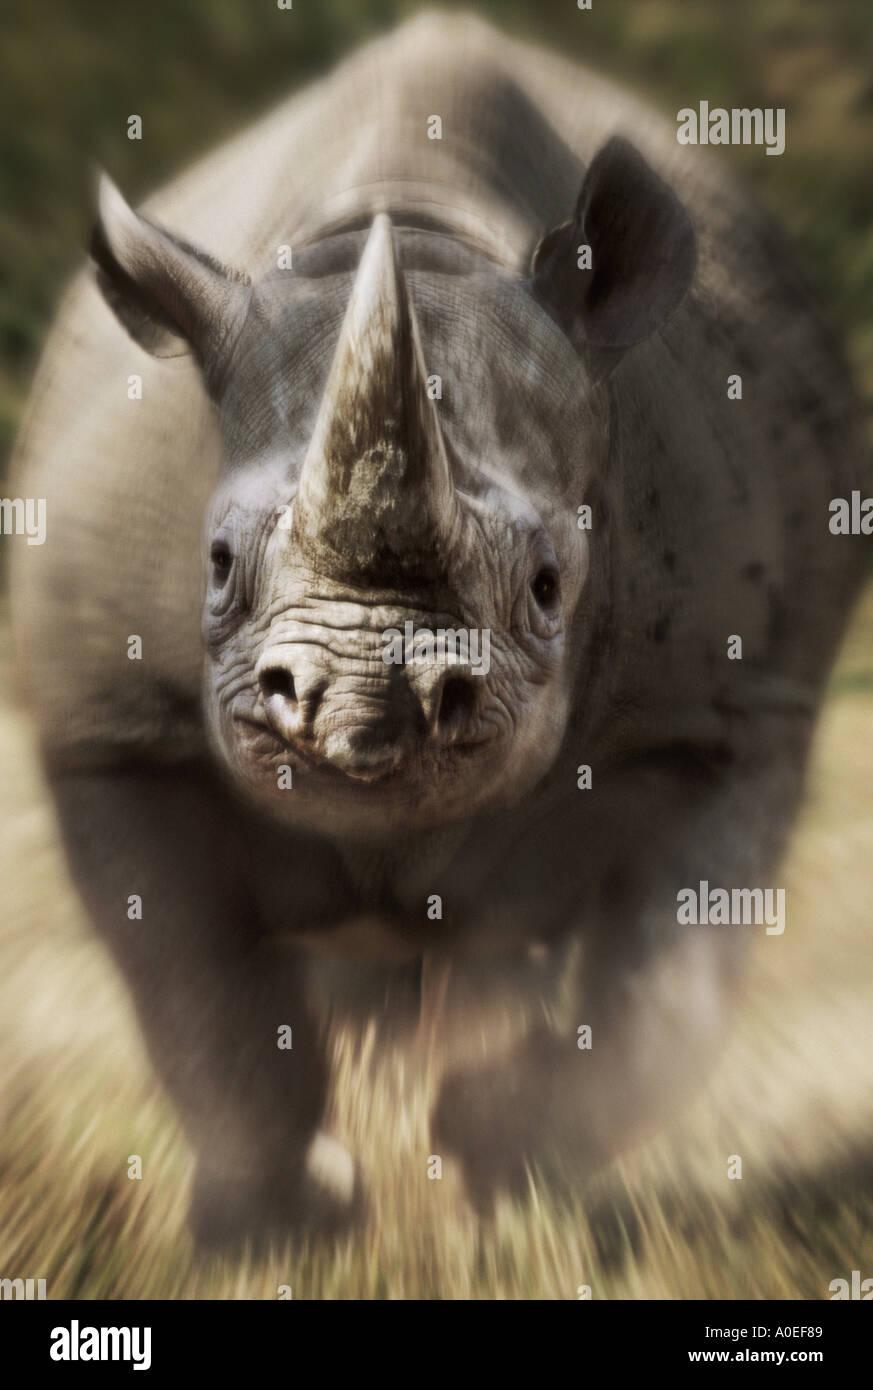 Charging black rhinoceros Kenya - Stock Image